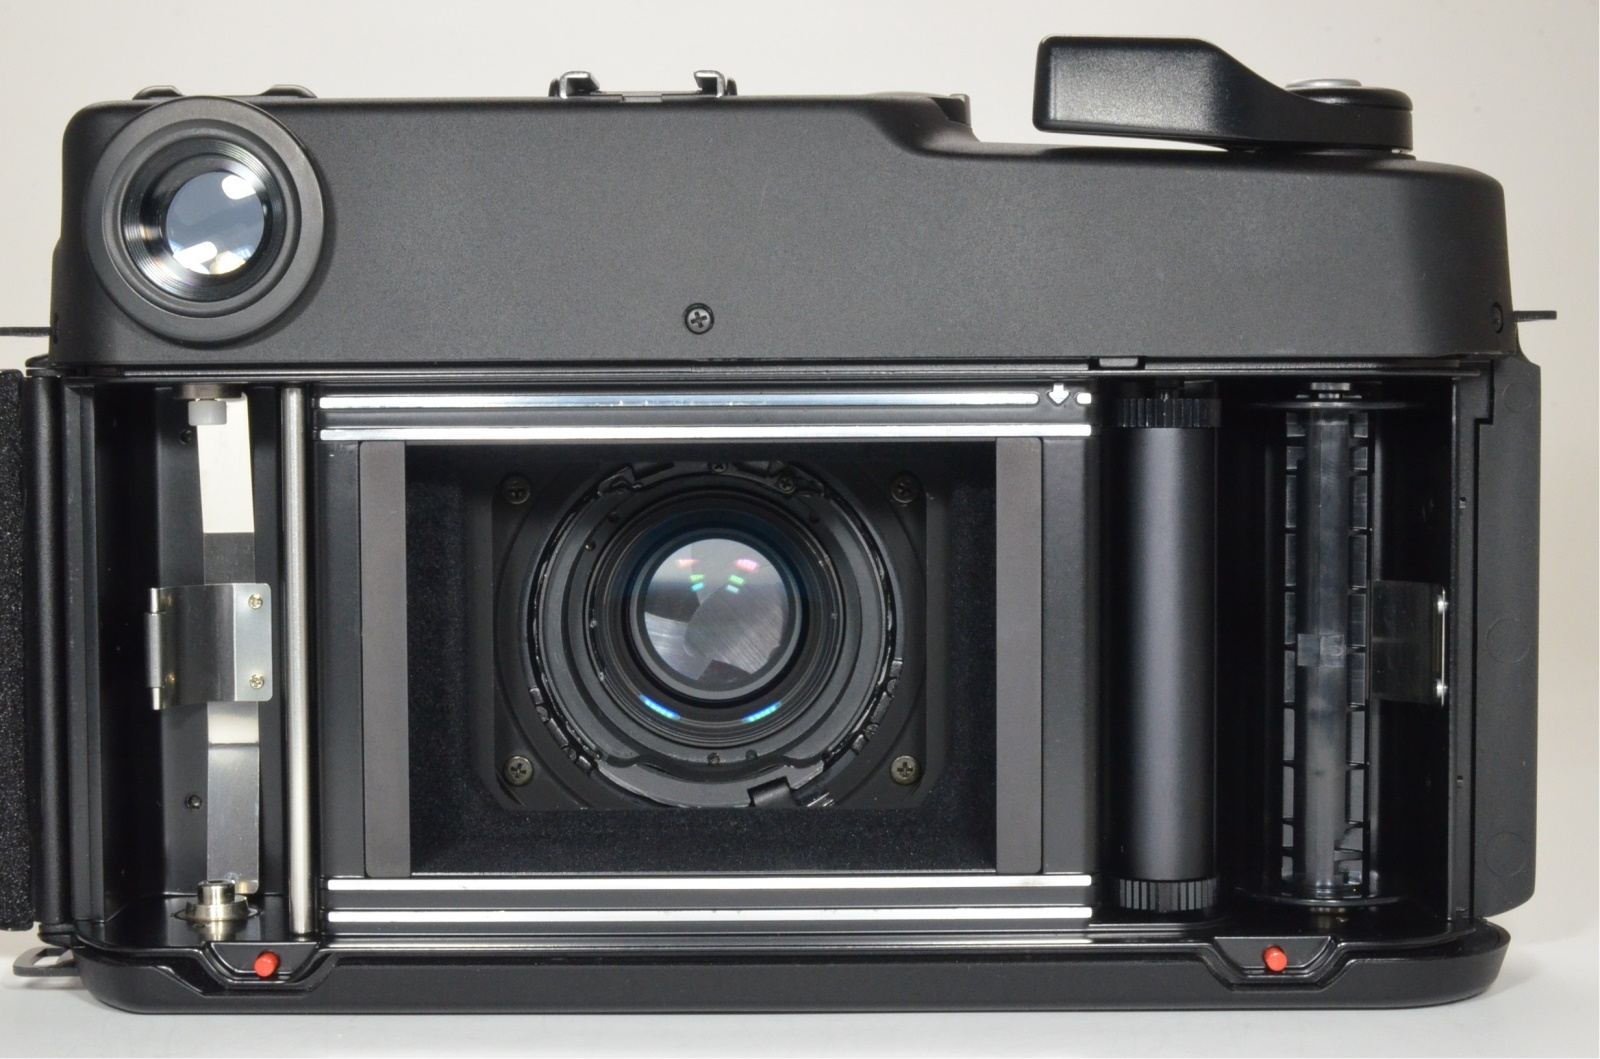 fuji fujifilm gw680iii 90mm f3.5 count 025 medium format camera cla'd recently shooting tested